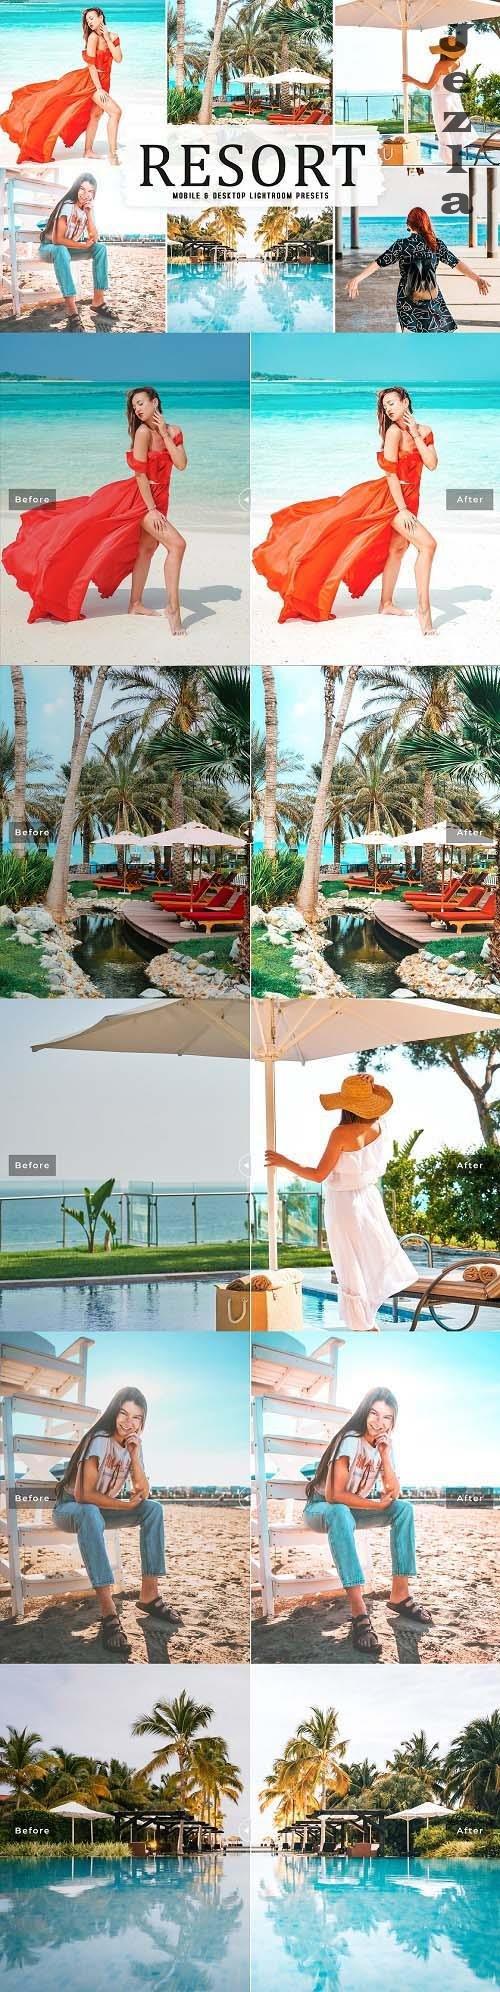 Resort Pro LRM Presets - 6234934